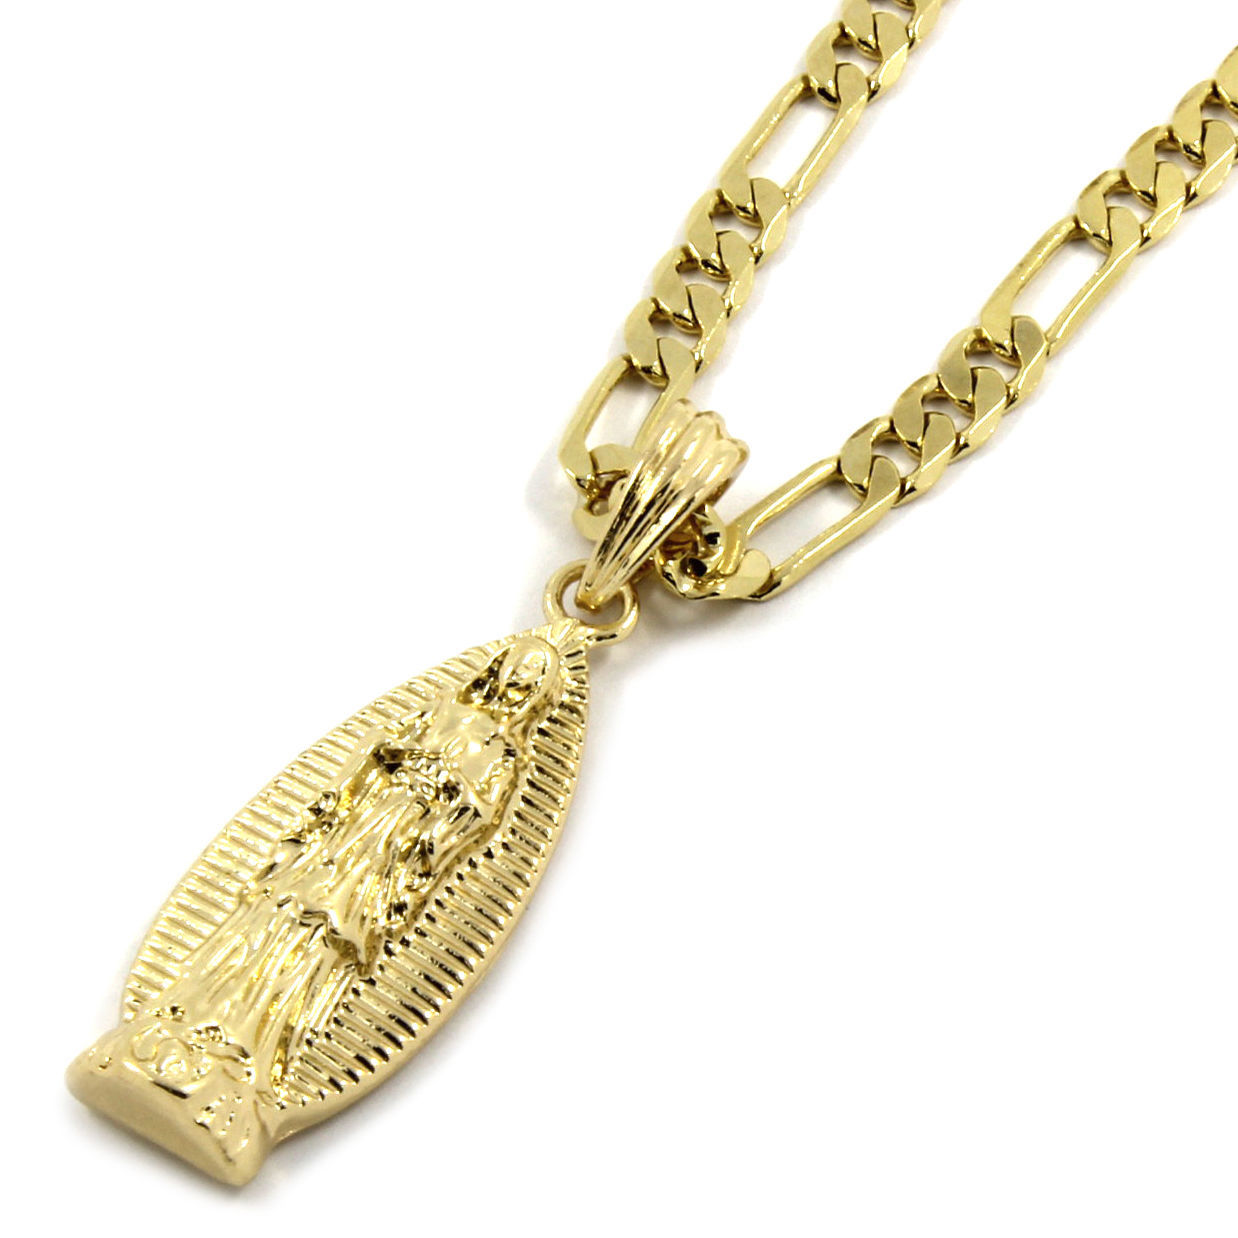 Mens 14K Gold Plated Long Virgin Mary and 50 similar items